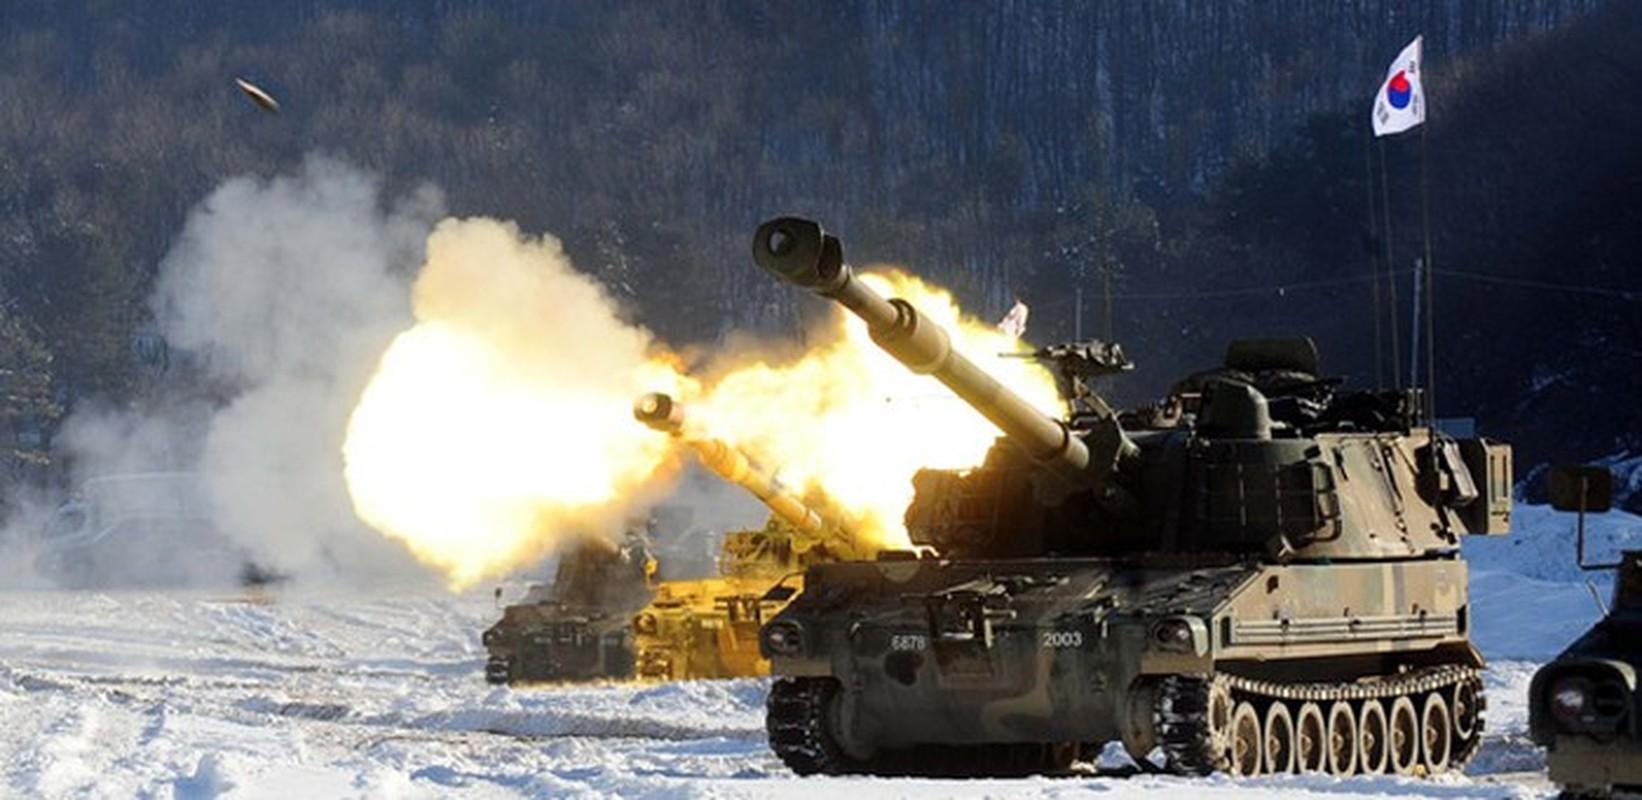 K2 Black Panther: Vu khi nang tam nen cong nghiep quoc phong Han Quoc-Hinh-2